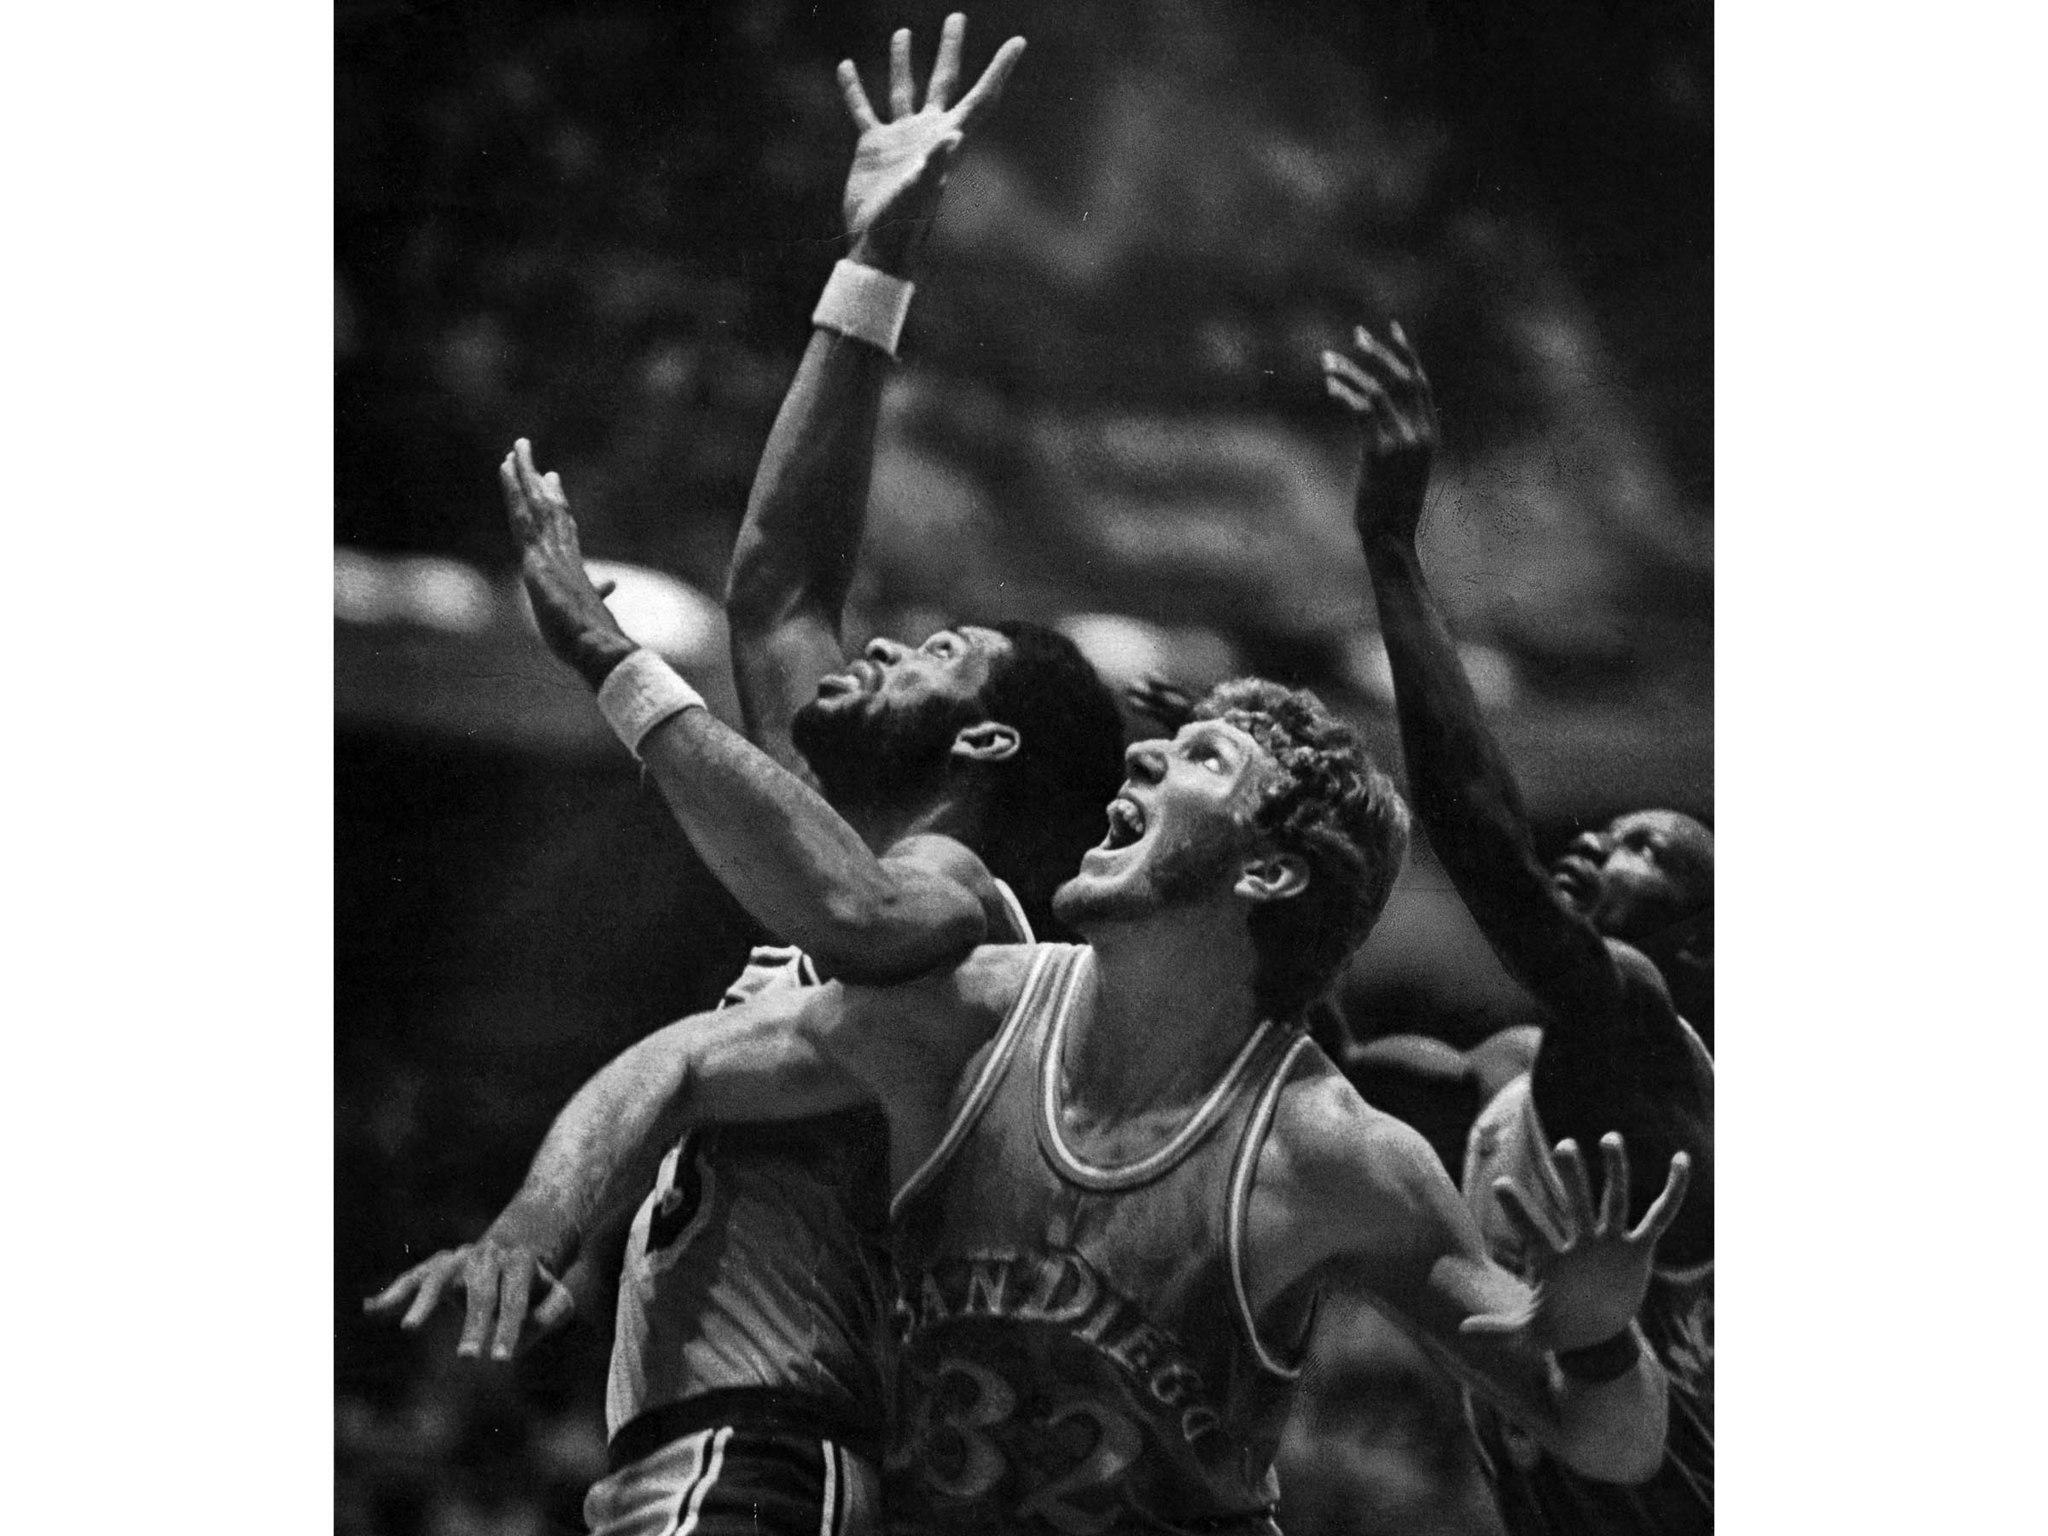 Kareem Abdul-Jabbar and Bill Walton